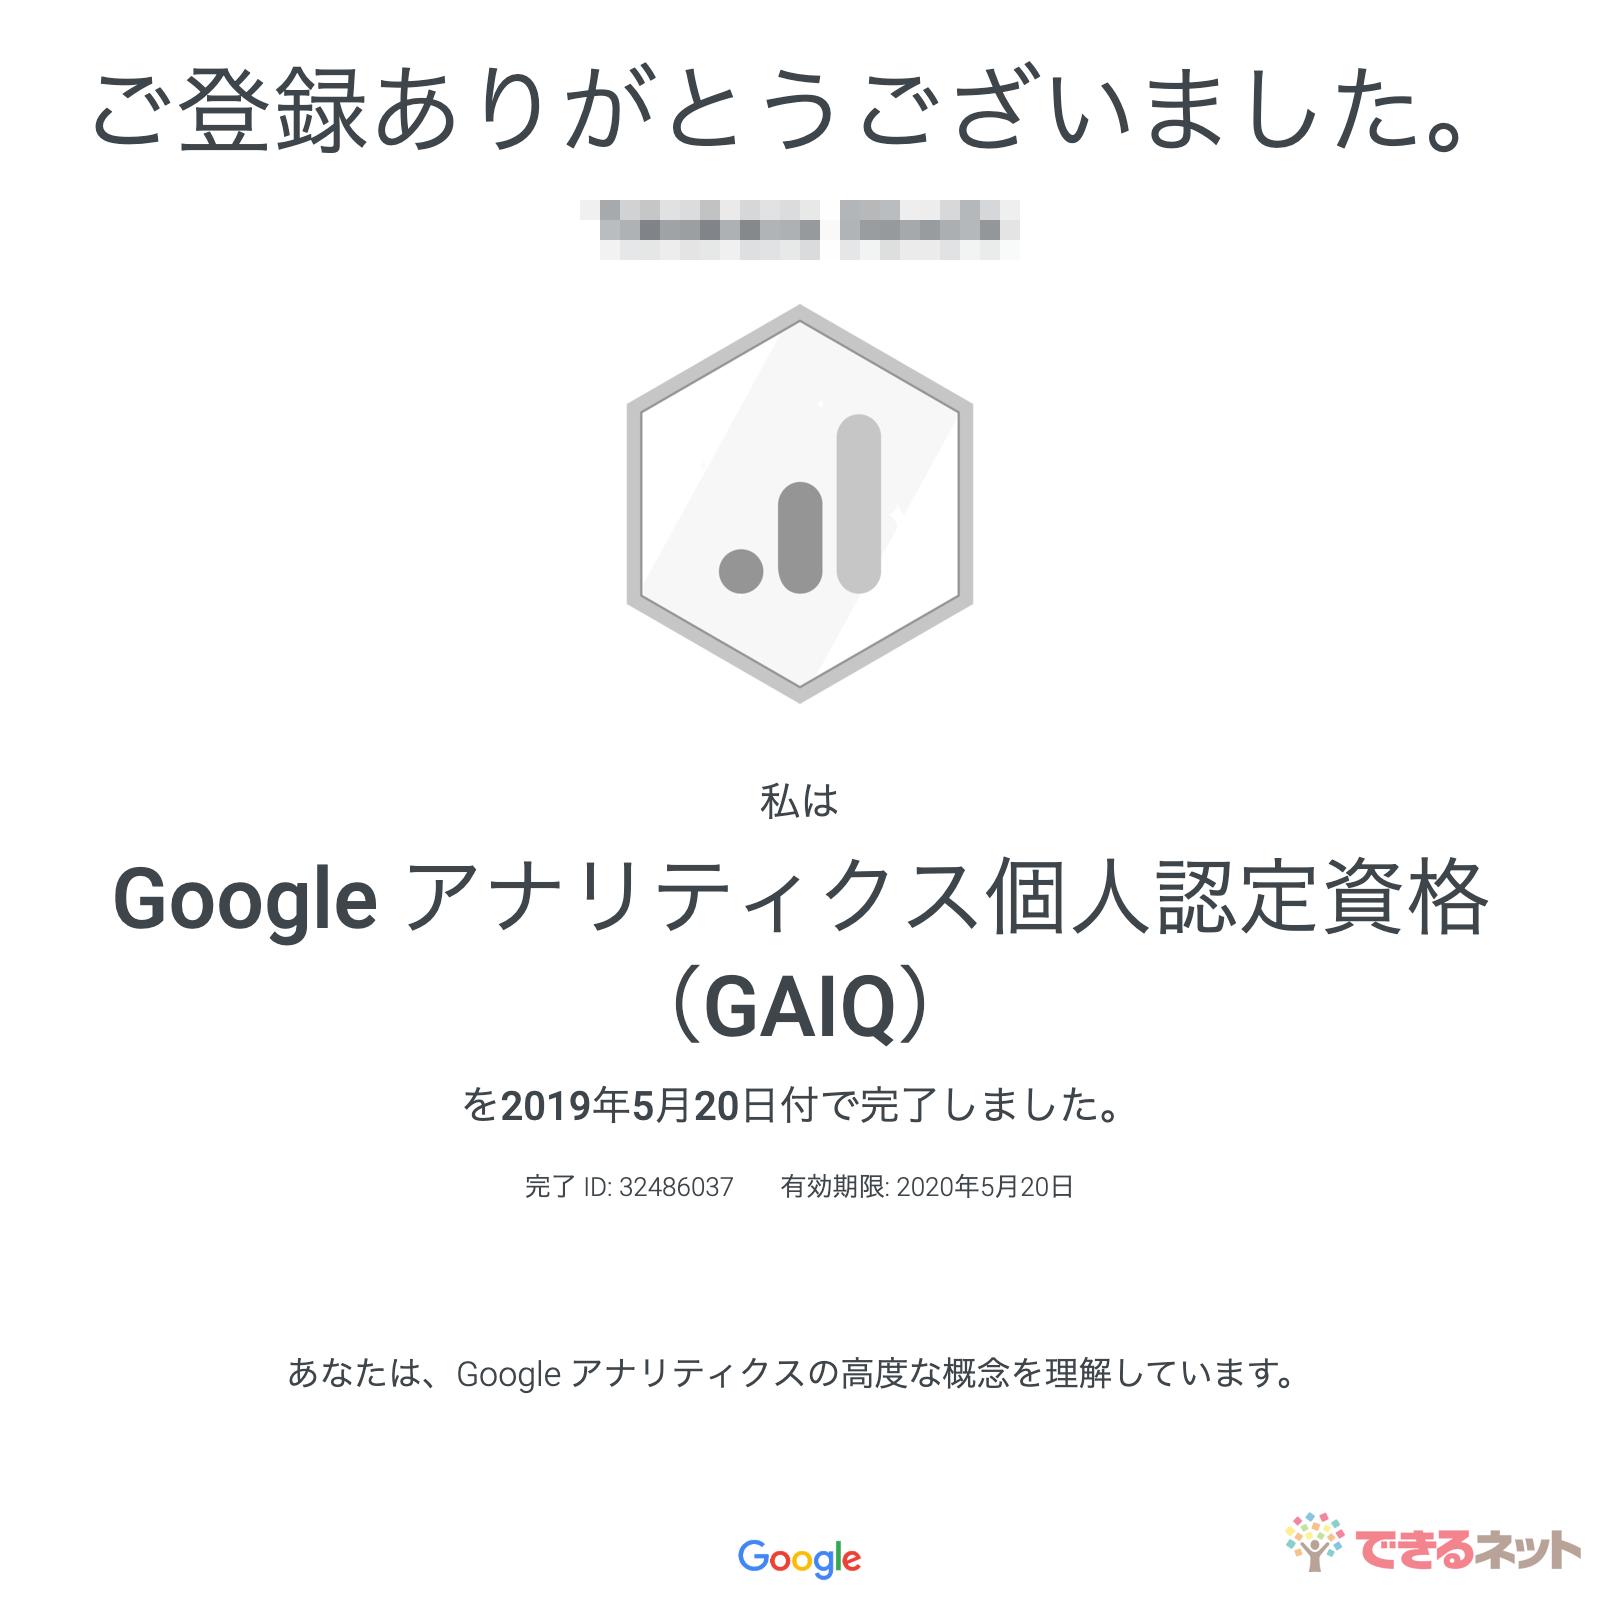 GAIQの個人認定資格証